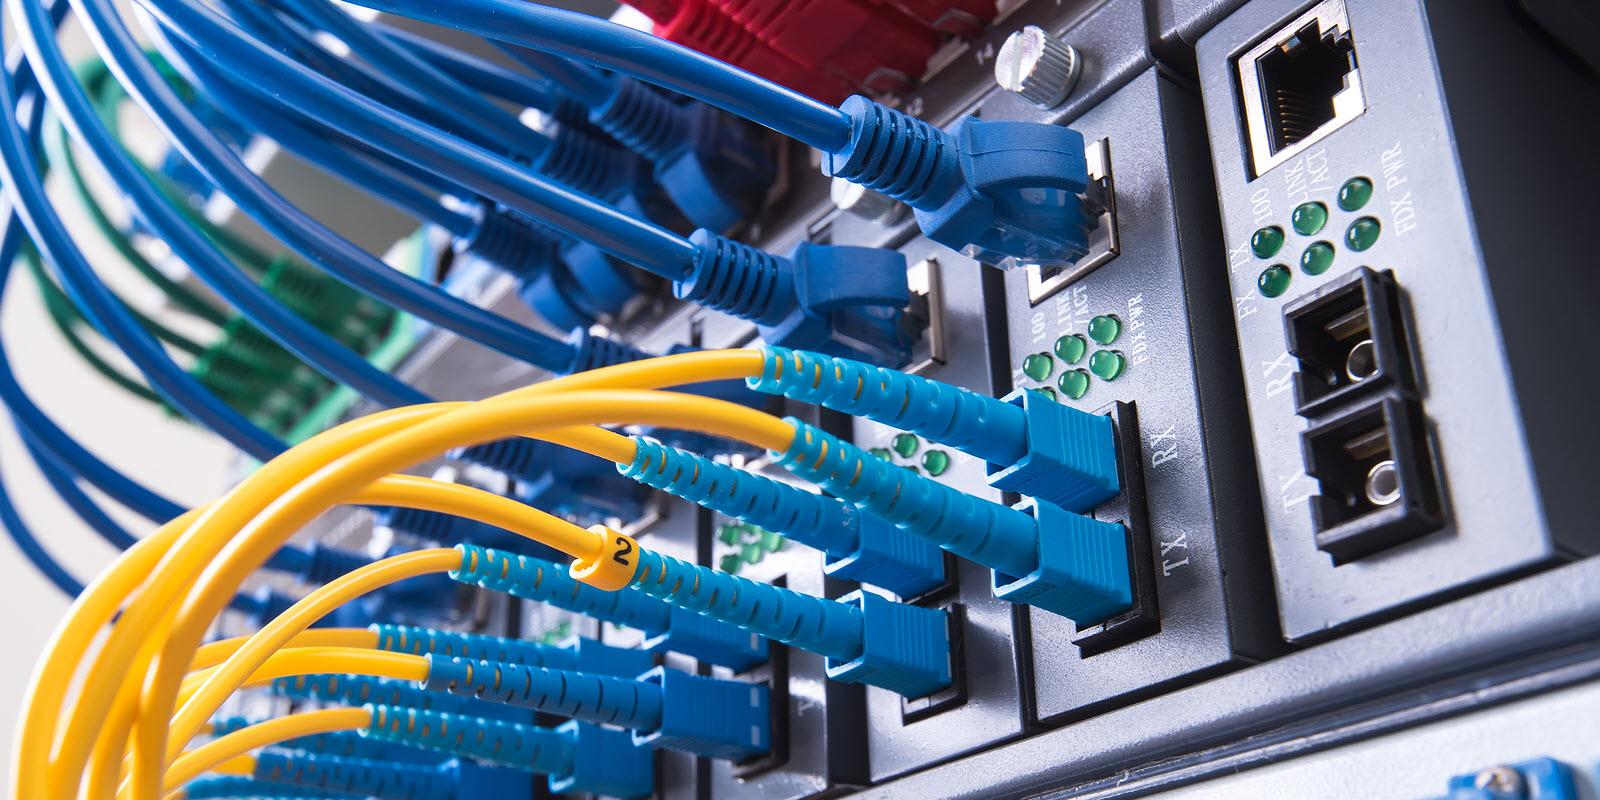 Fiber Optic Technology Home Wiring Wyllnets Optics Services